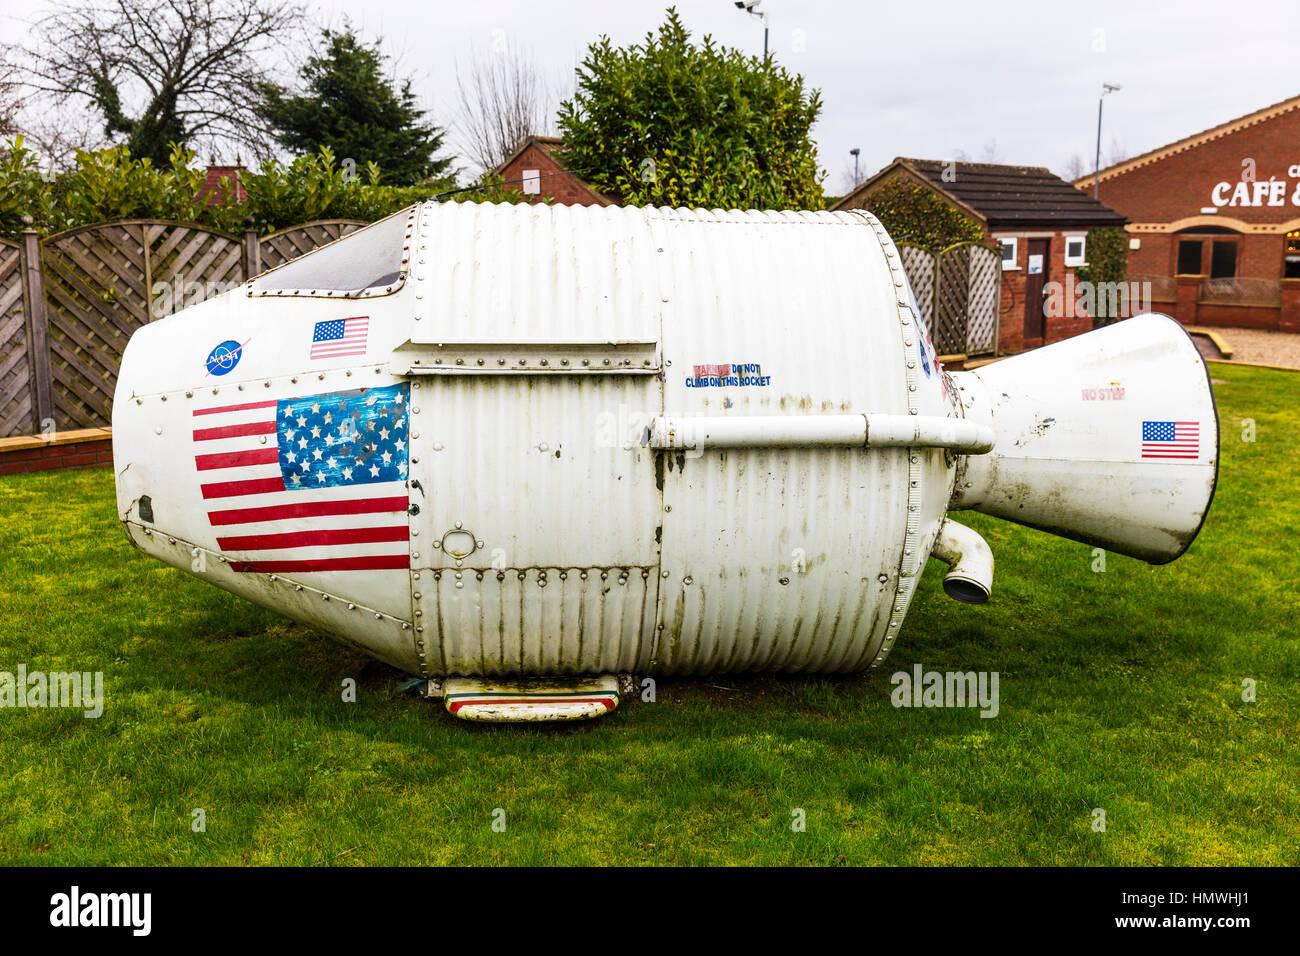 nasa space shuttle landing on earth - photo #44